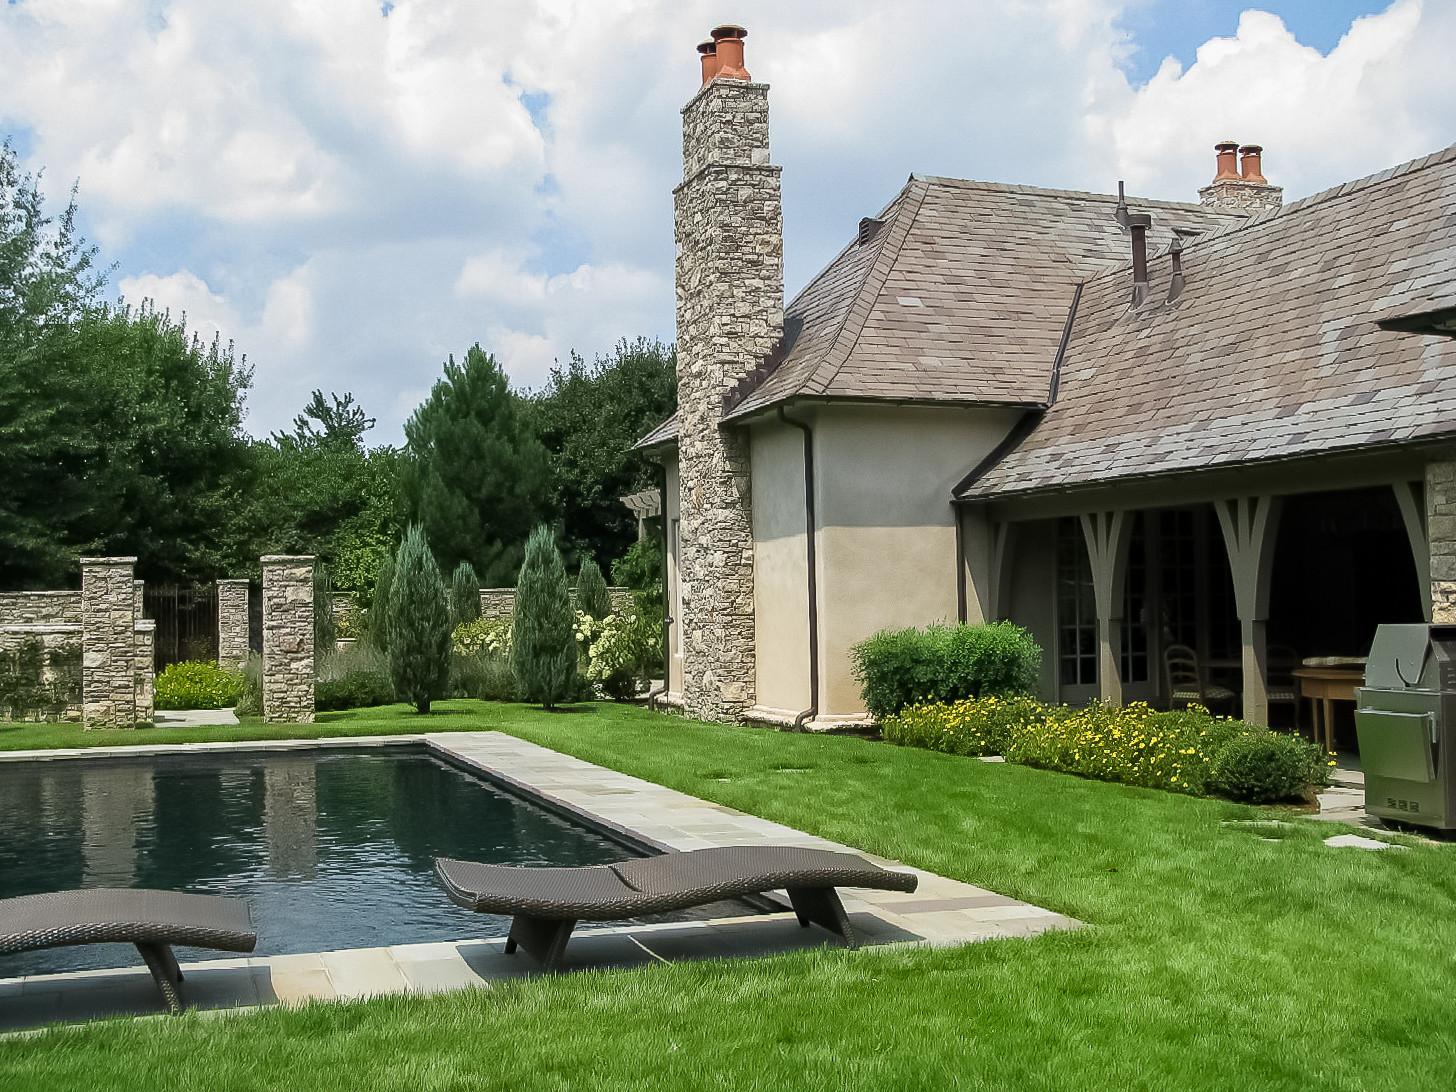 Pool and Interior Garden Area